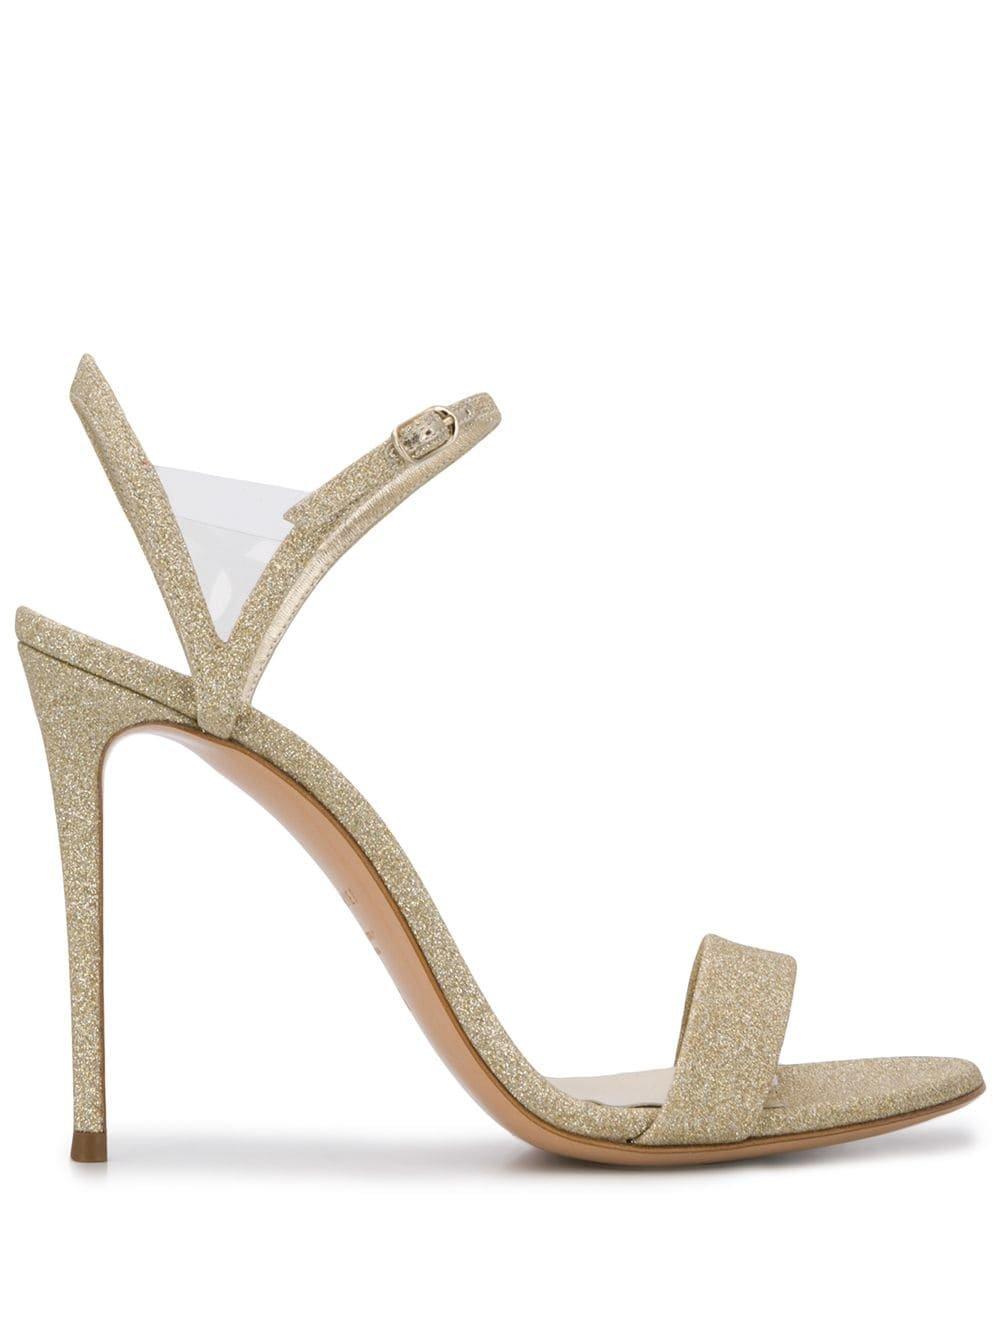 Gold Casadei Glittered 110mm Sandals | Farfetch.com